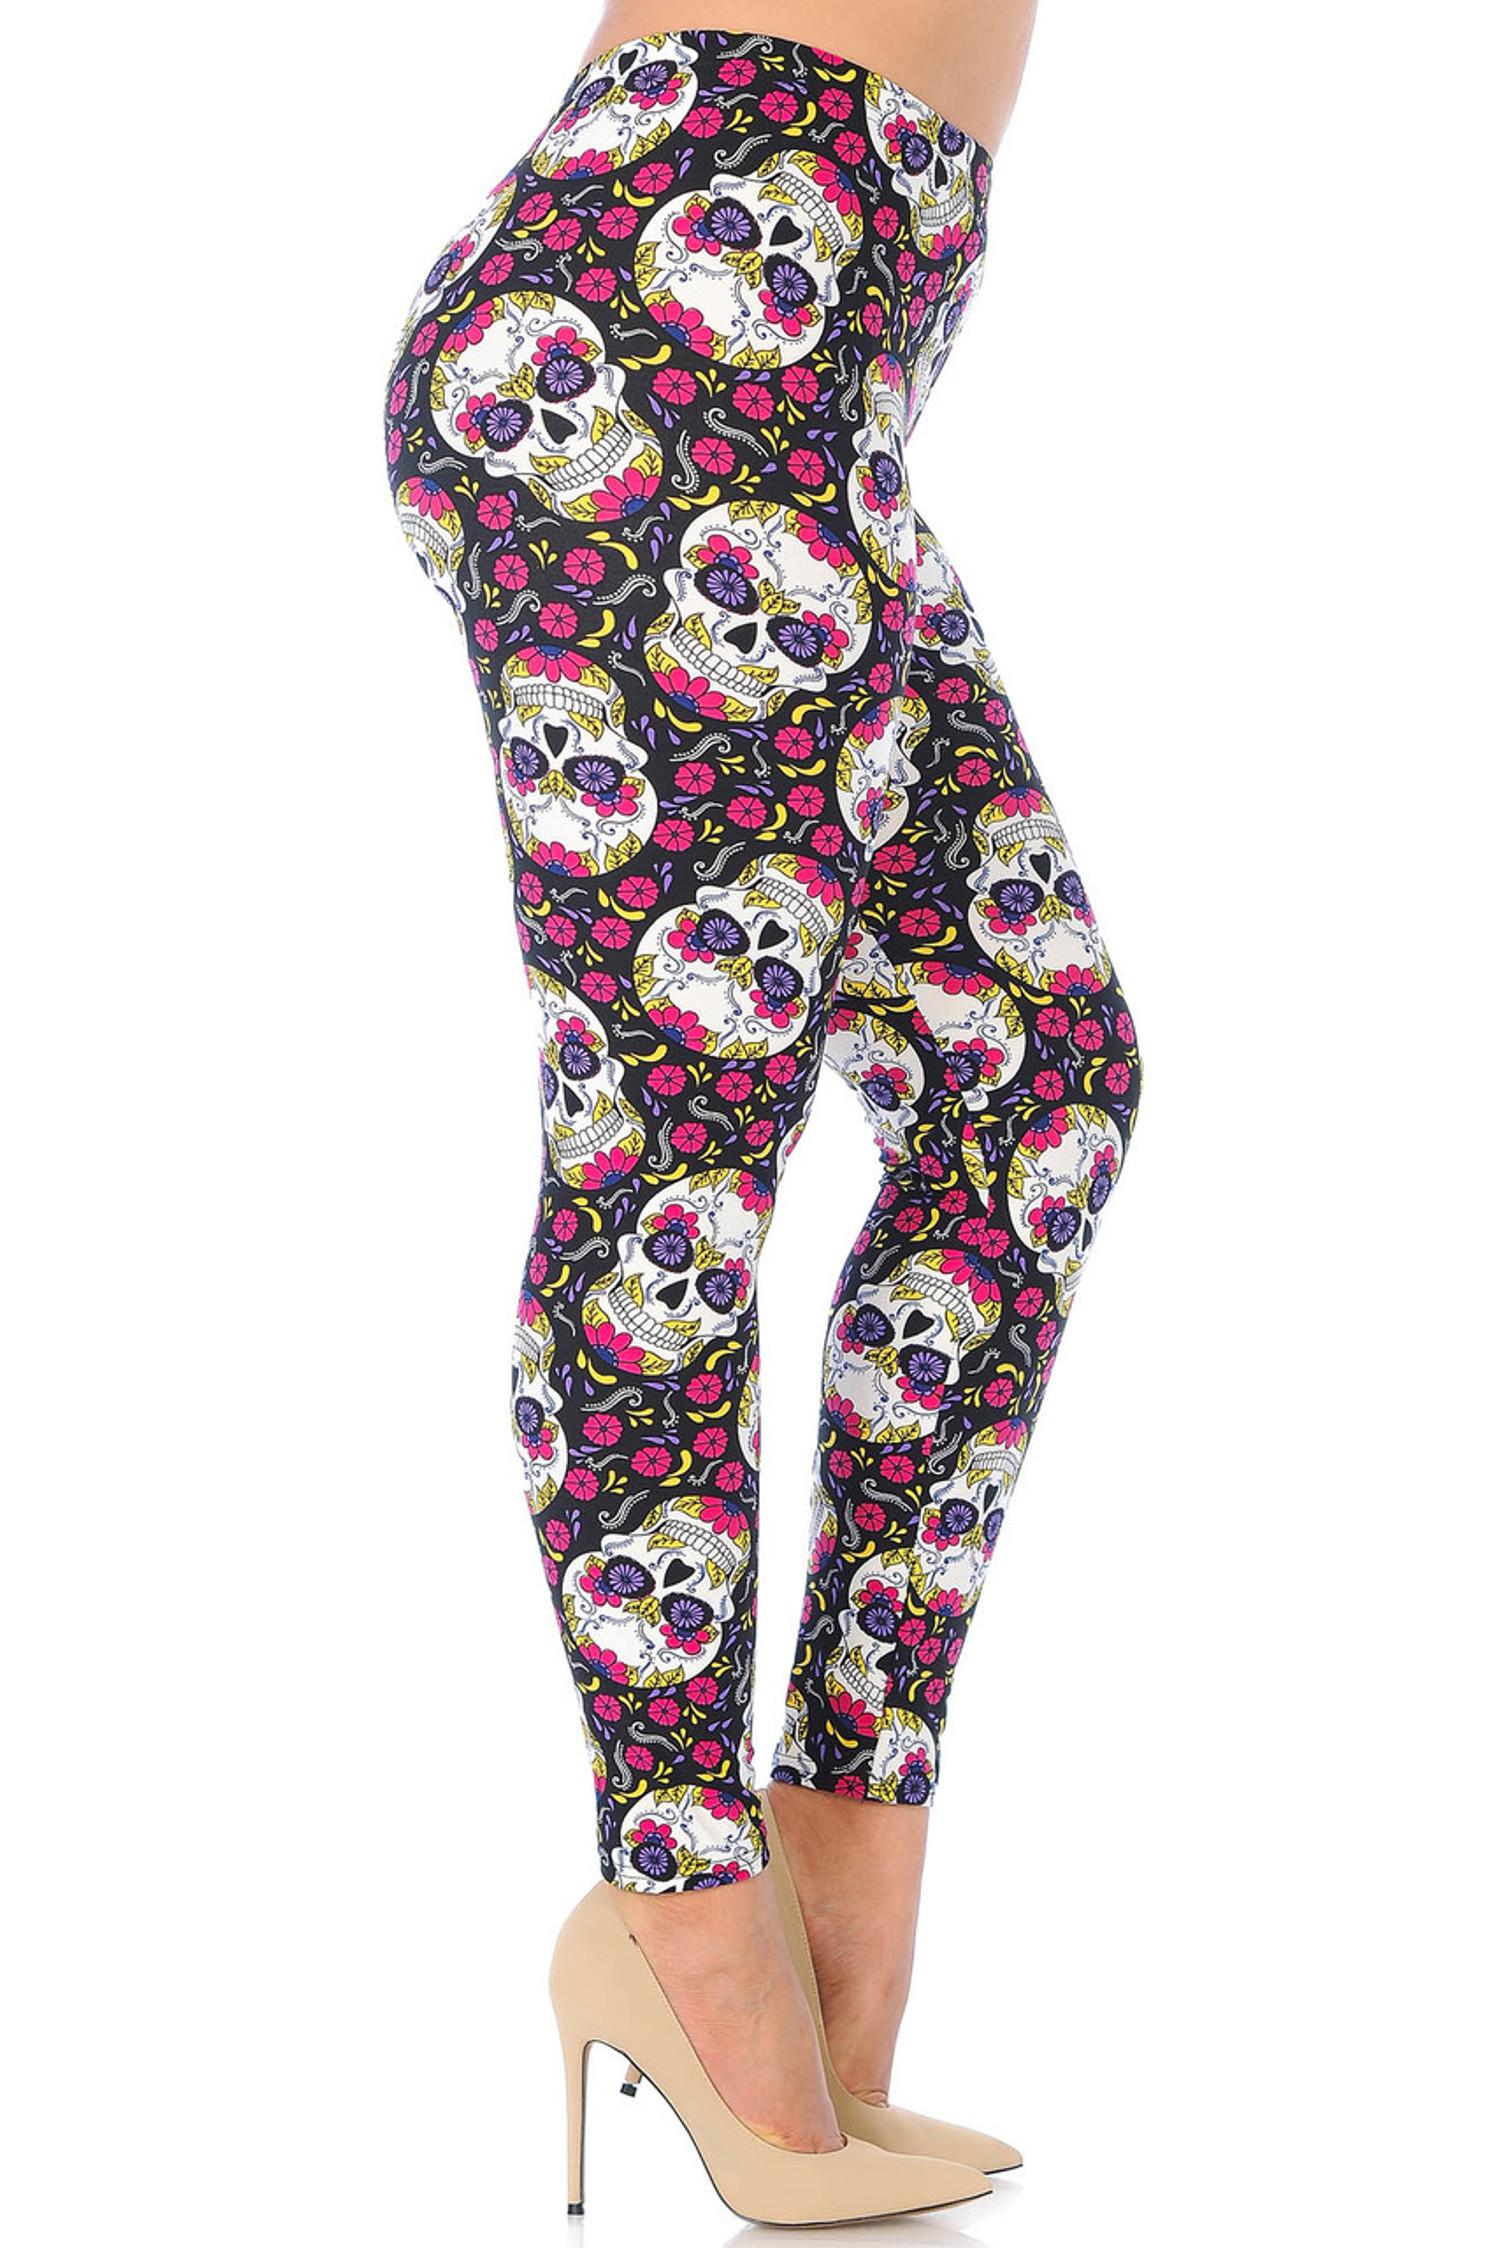 Brushed  Floral Petal Sugar Skull Extra Plus Size Leggings - 3X-5X